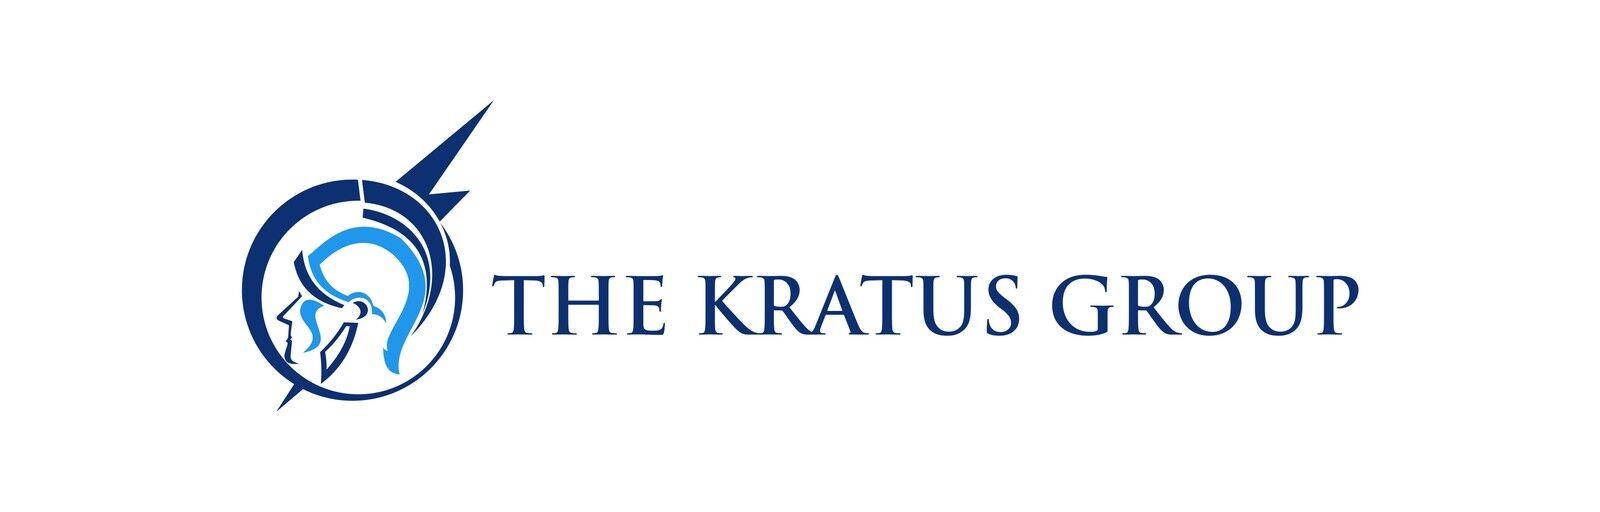 The Kratus Group